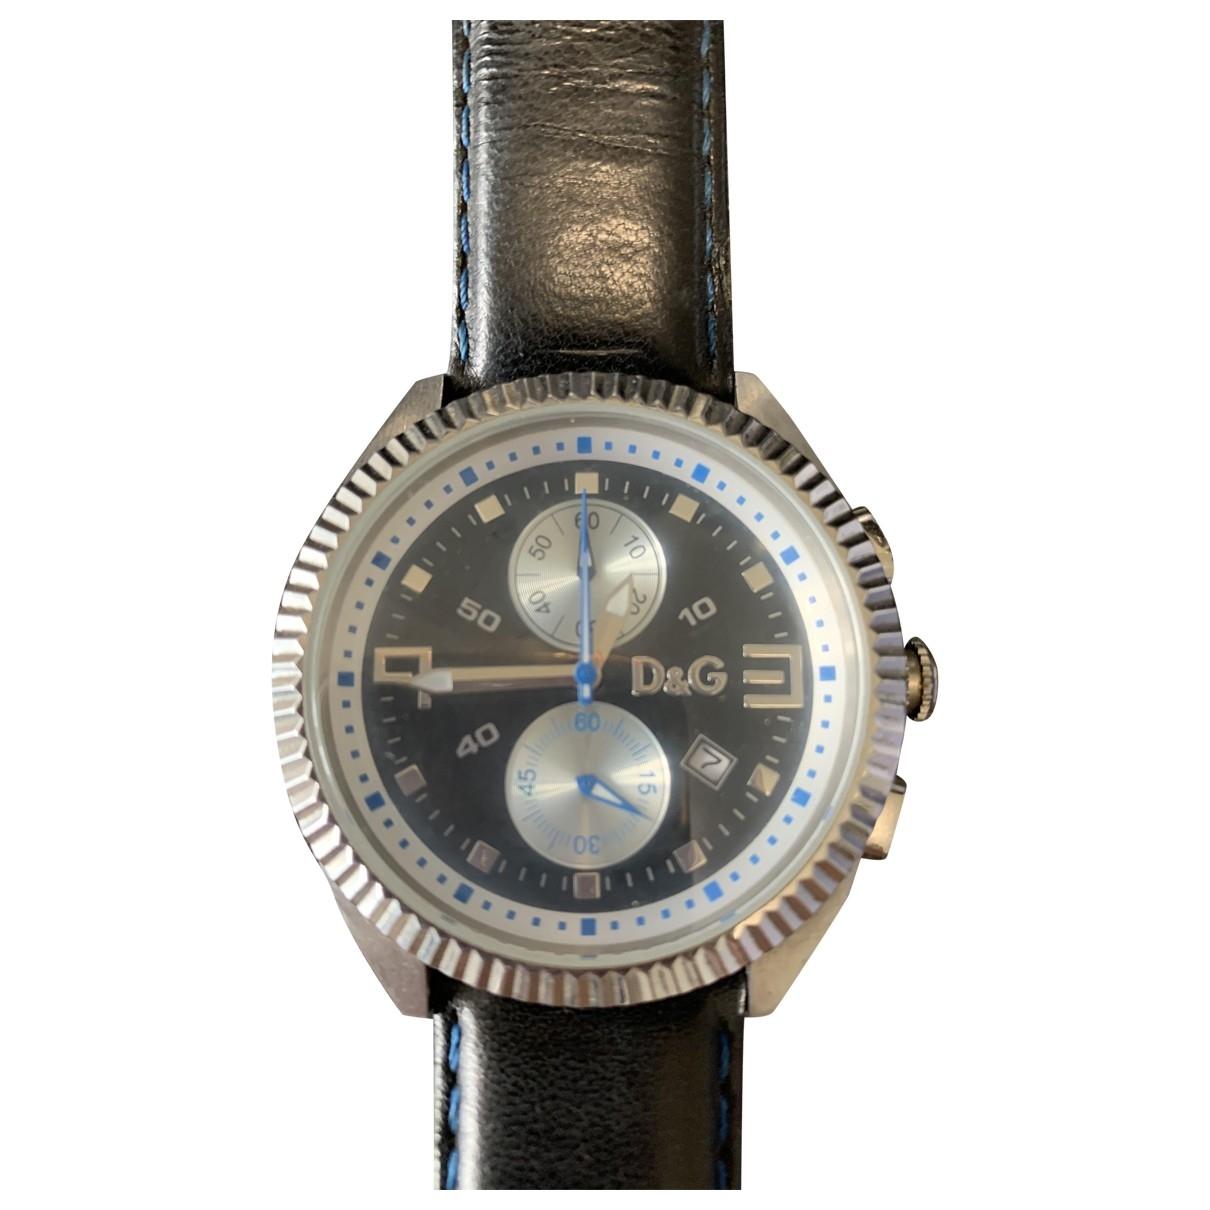 Relojes Dolce & Gabbana